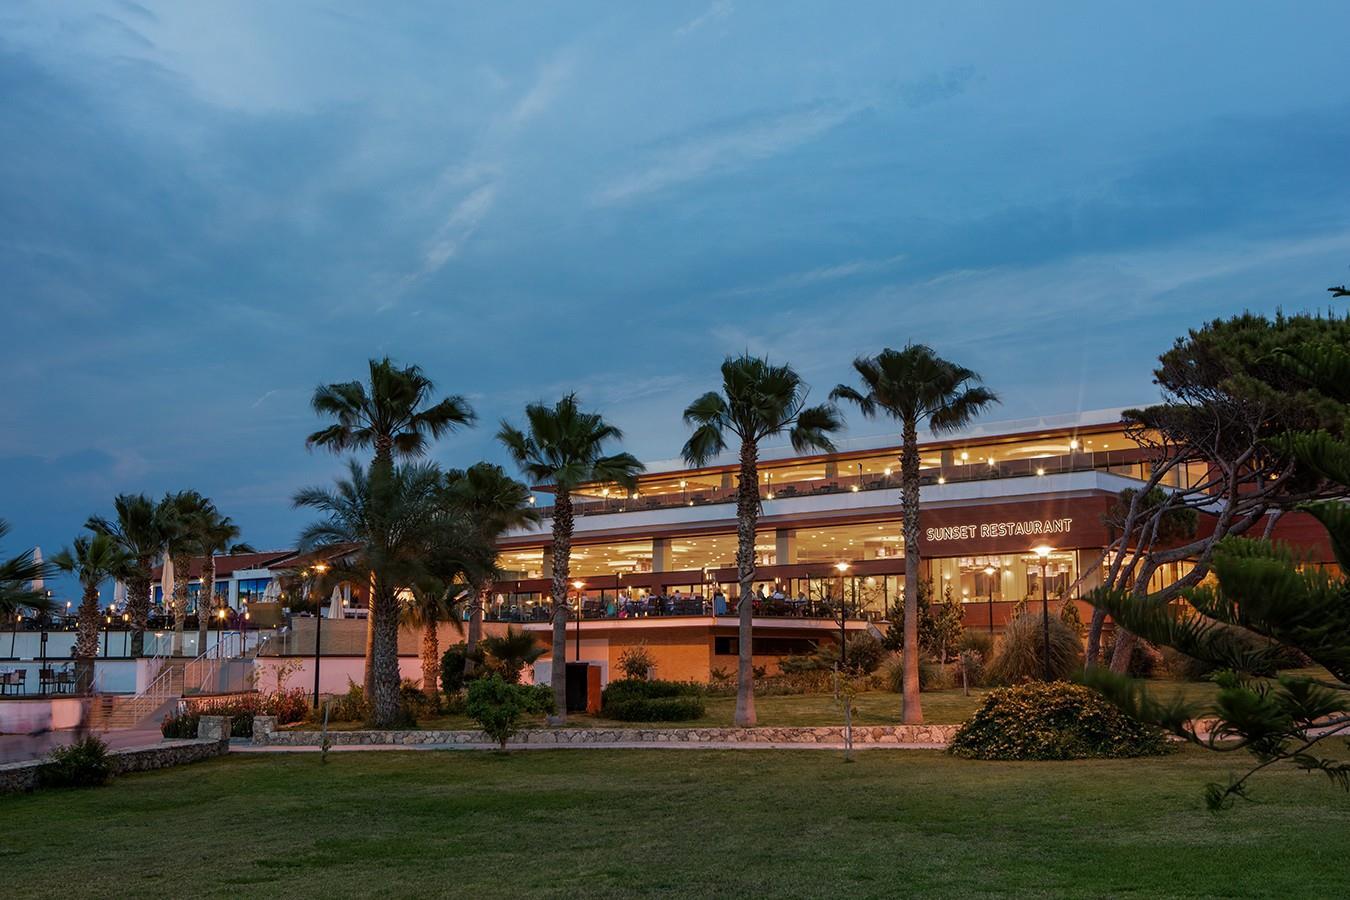 Acapulco Resort Convention Spa205131